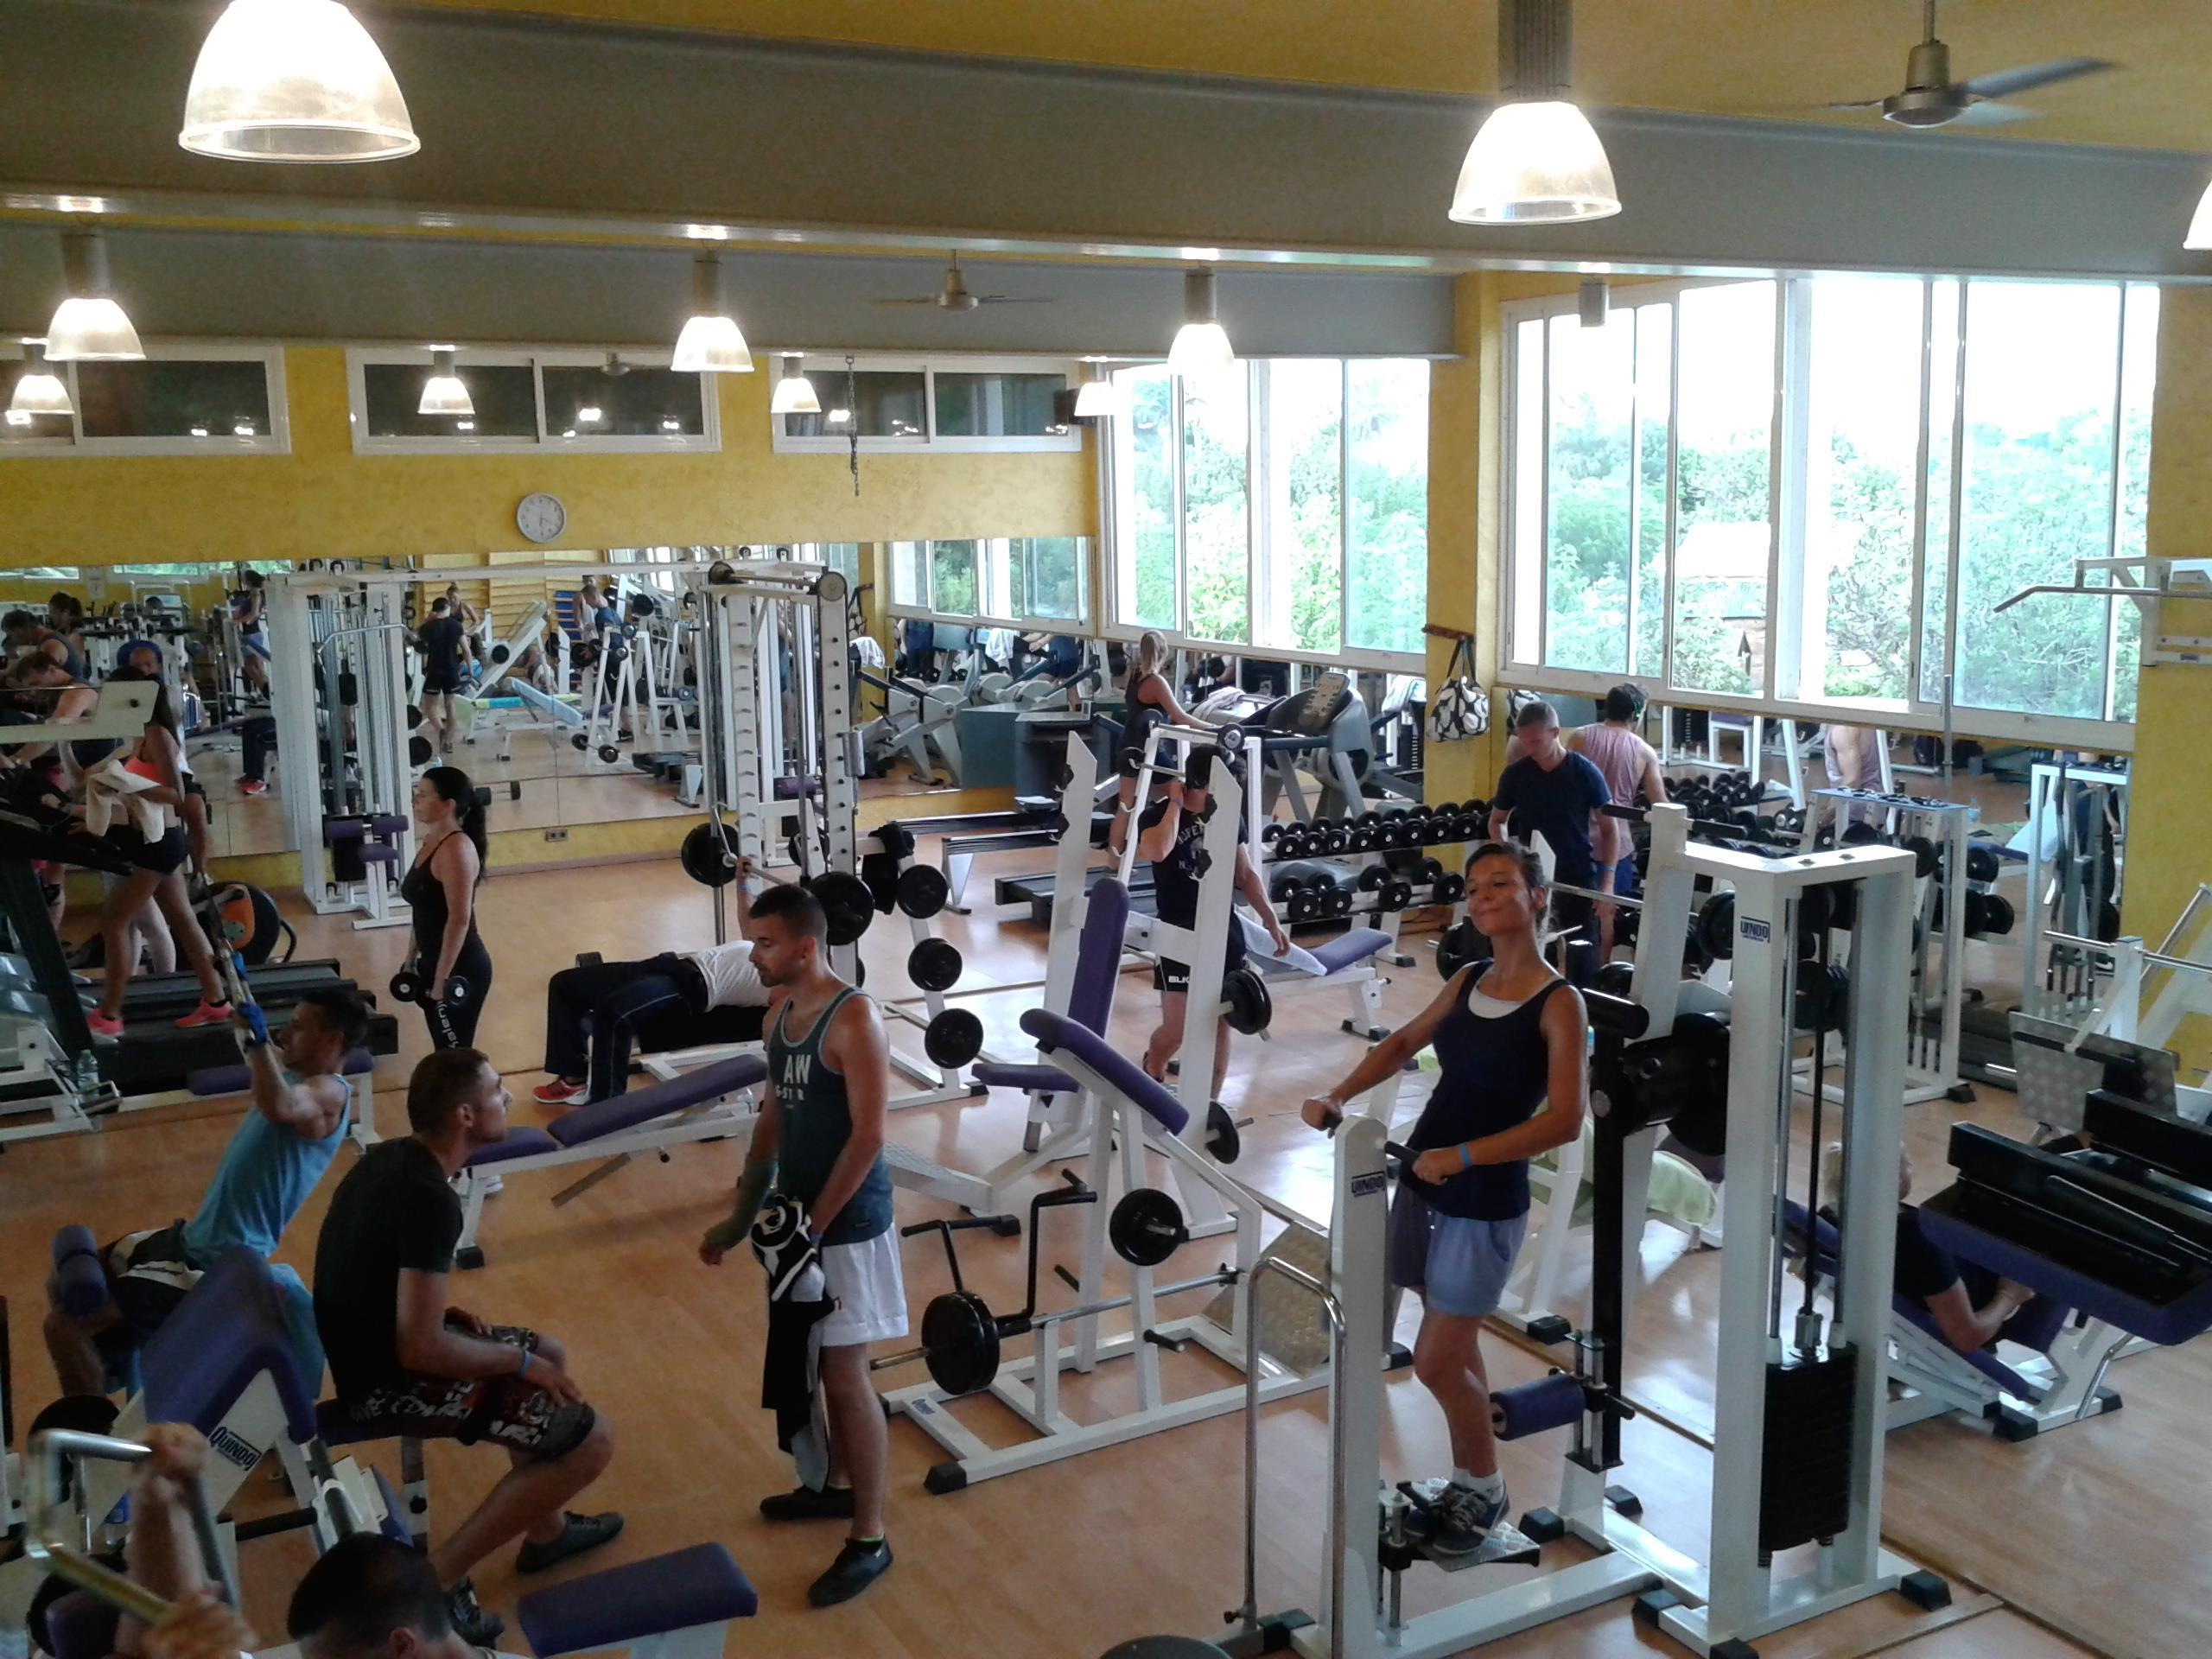 Fitnessruimte fitnesscentrum sportactiviteiten